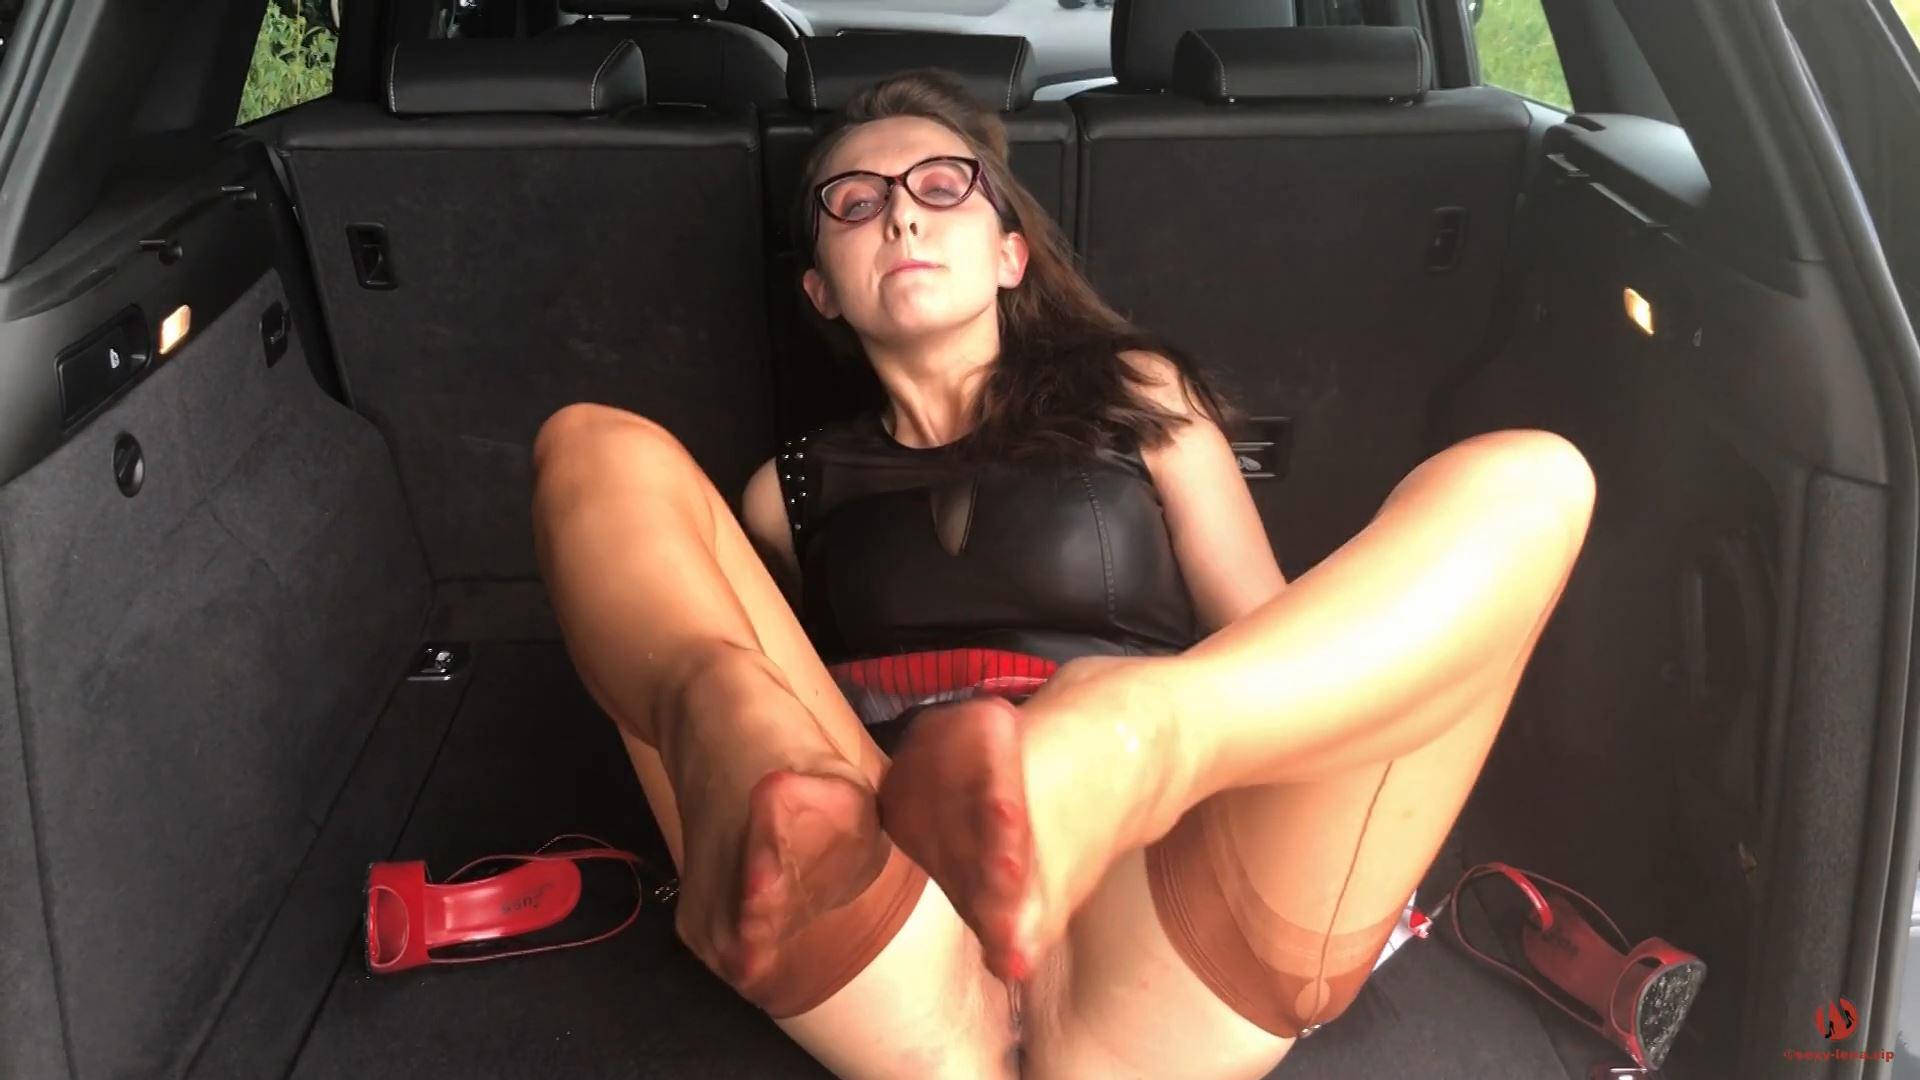 Fetish Model Lena In Scene: Seamed Nylon Stockings & Red Killer Heels - SEXY LENA VIP - FULL HD/1080p/MP4